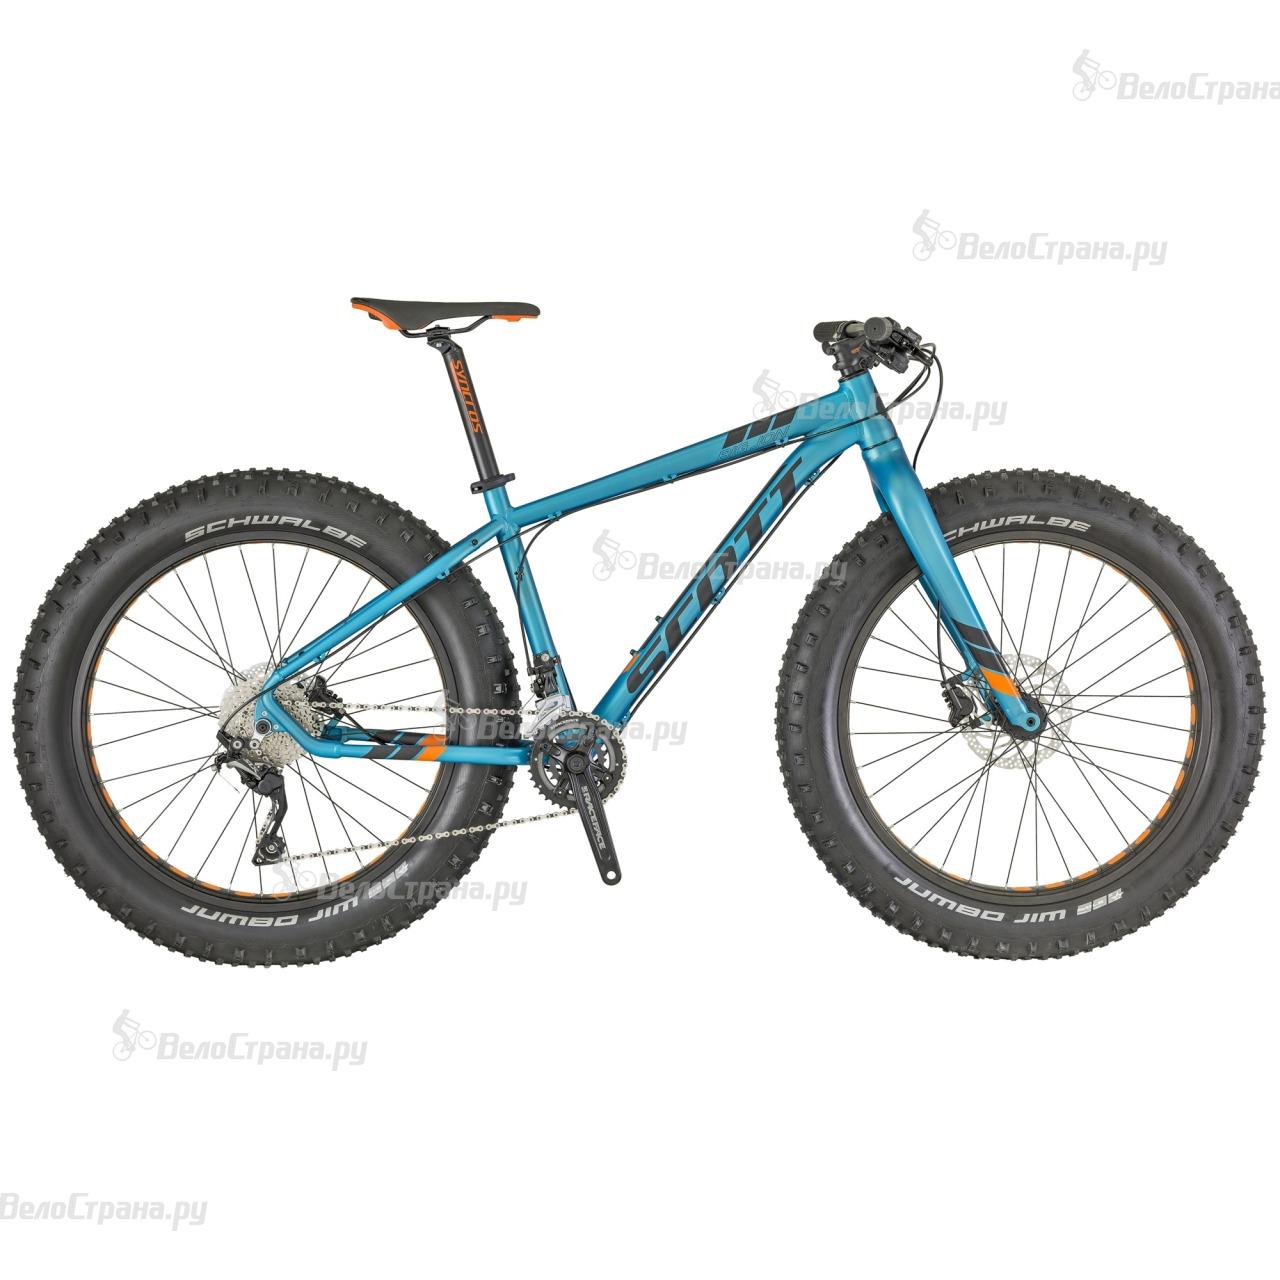 Велосипед Scott Big Jon (2018) jon chappell guitar for dummies